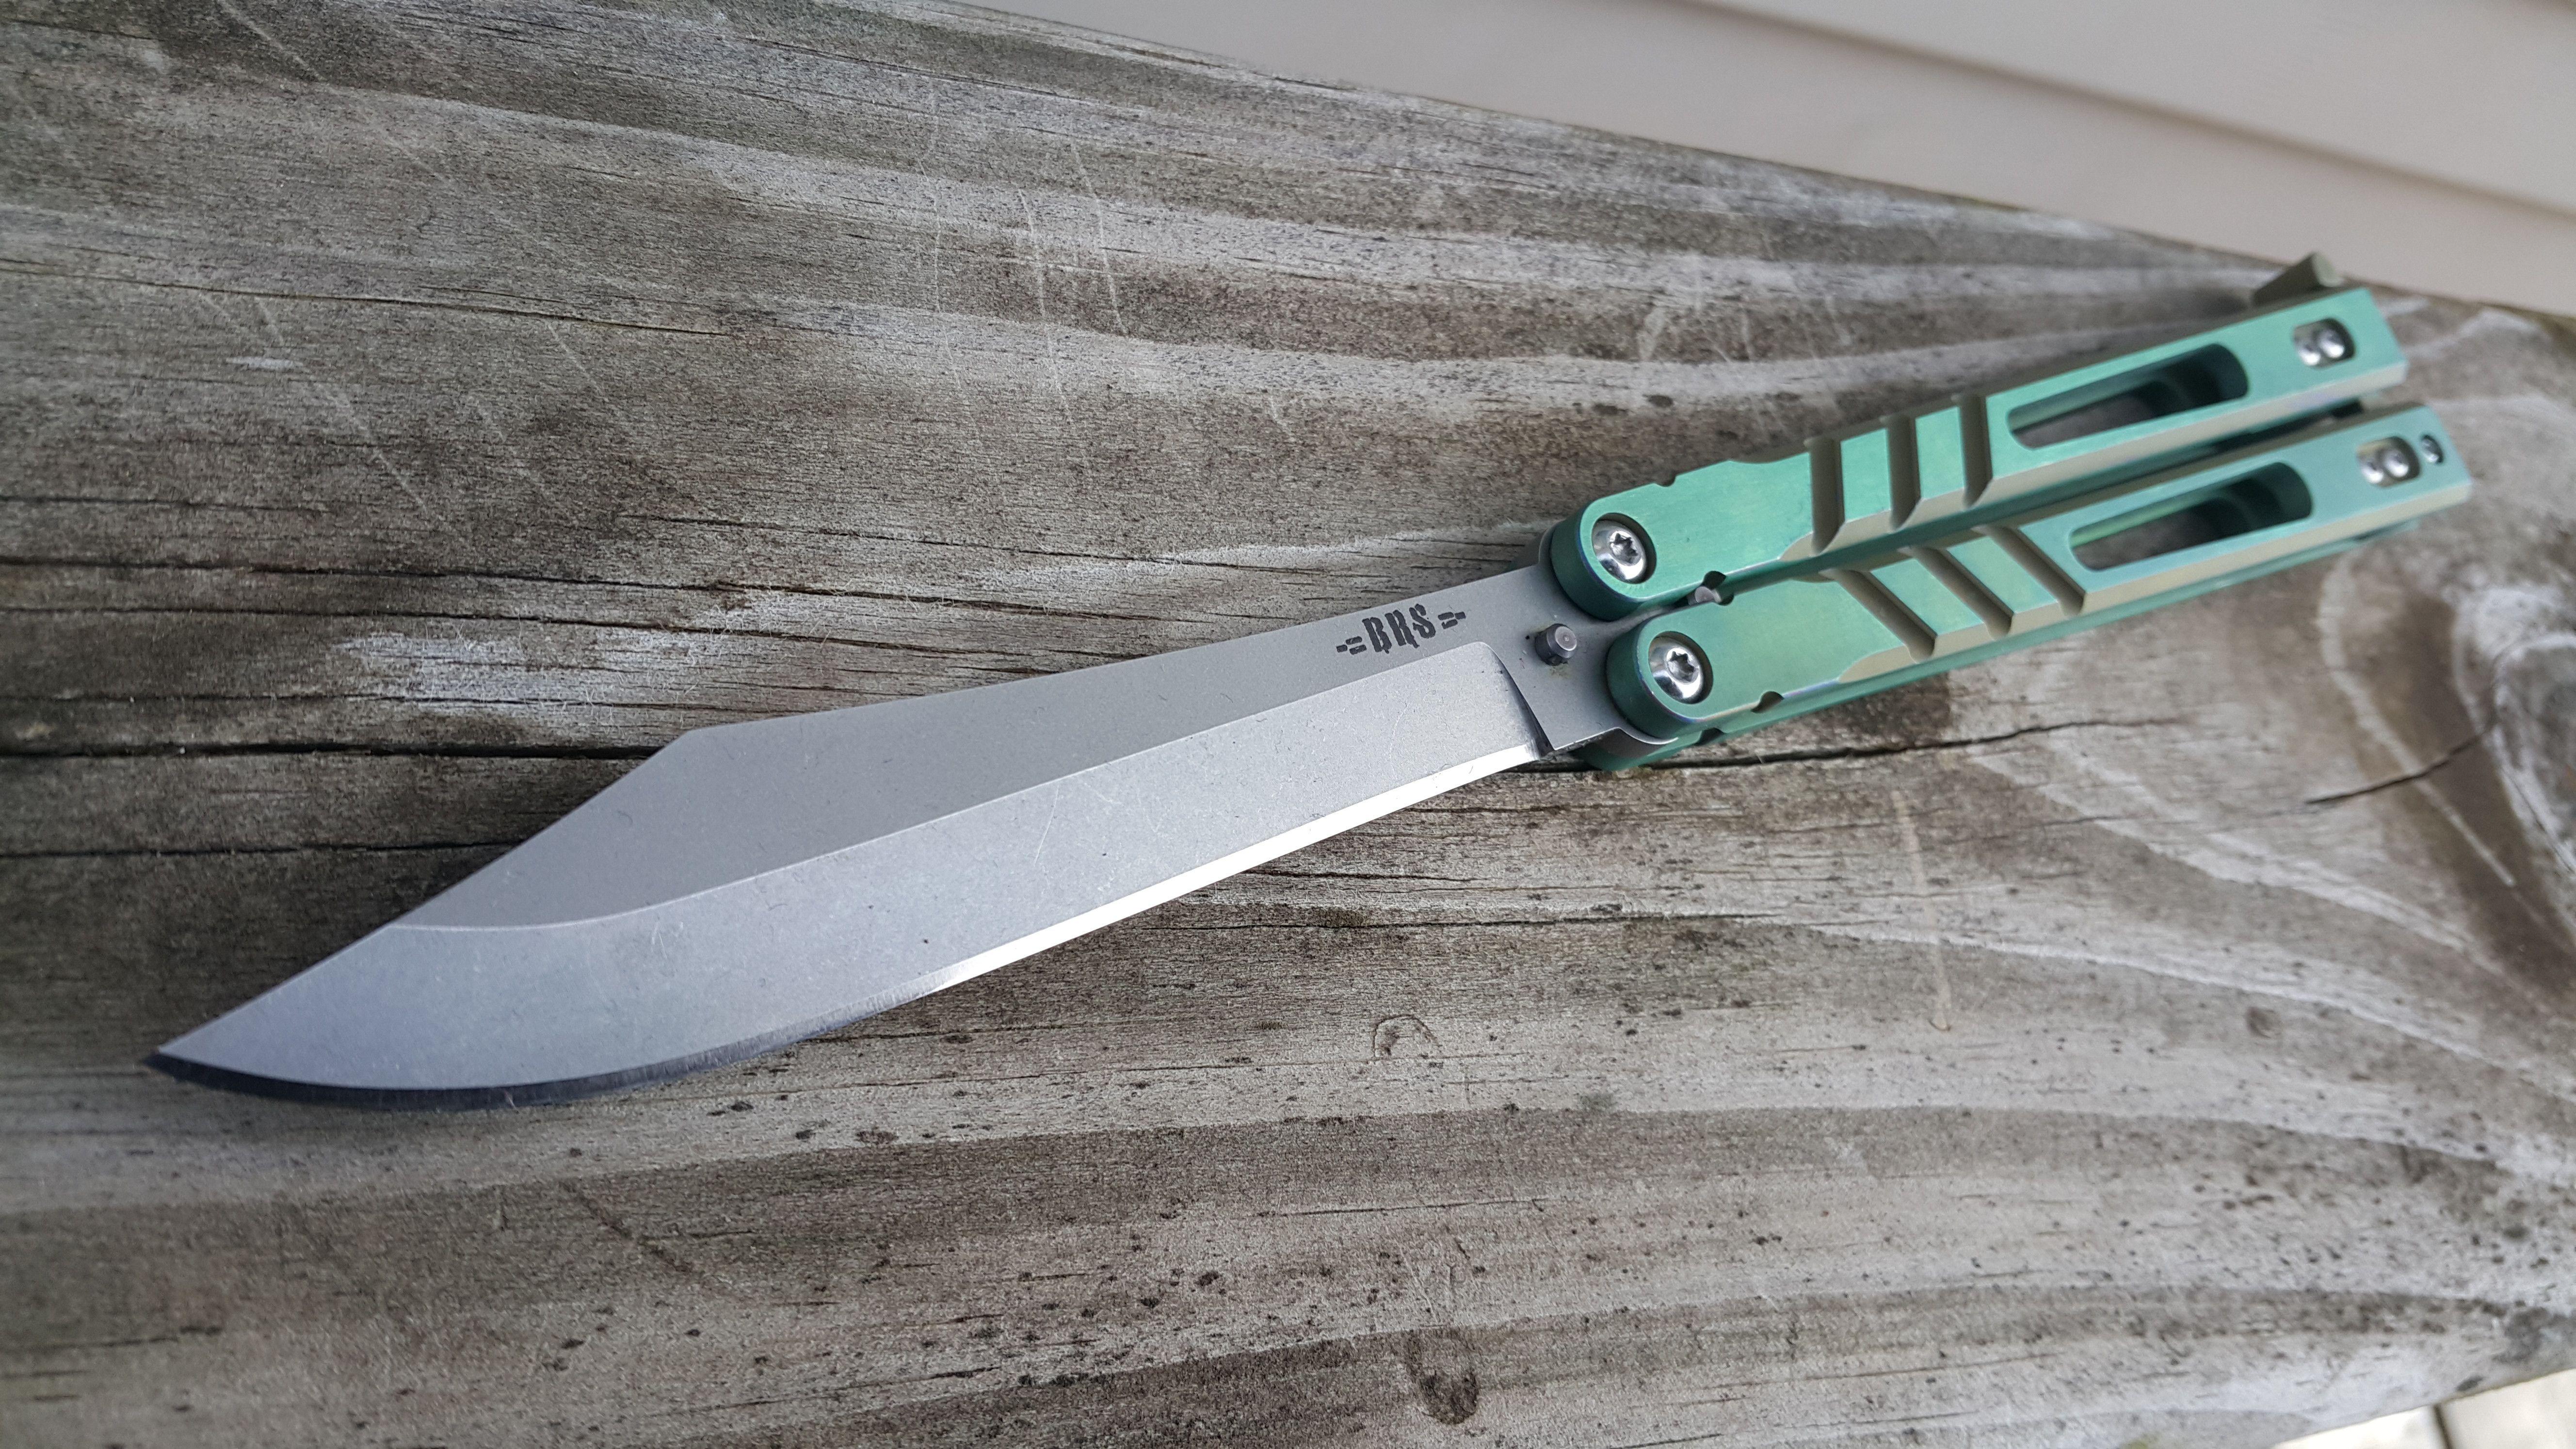 BRS Alpha Beast 3.0 Butterfly knife, Knife, Multitool